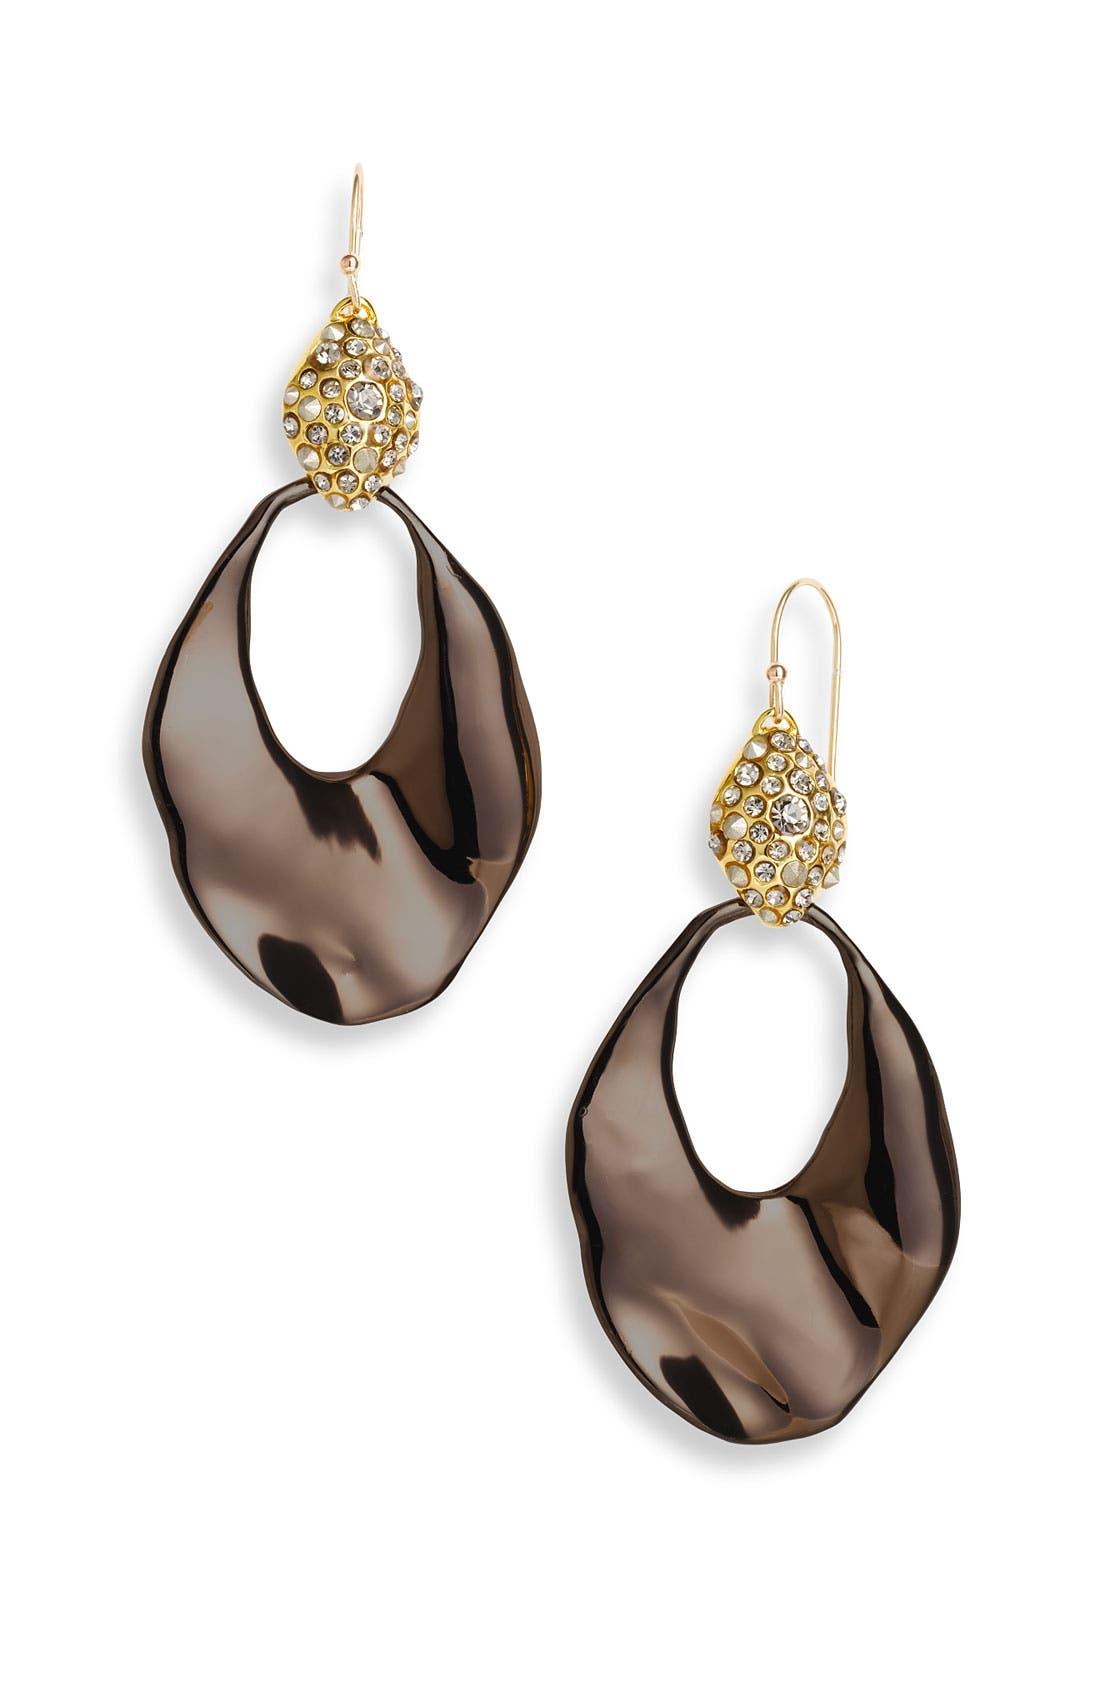 Main Image - Alexis Bittar 'Miss Havisham' Wavy Crystal Drop Earrings (Nordstrom Exclusive)